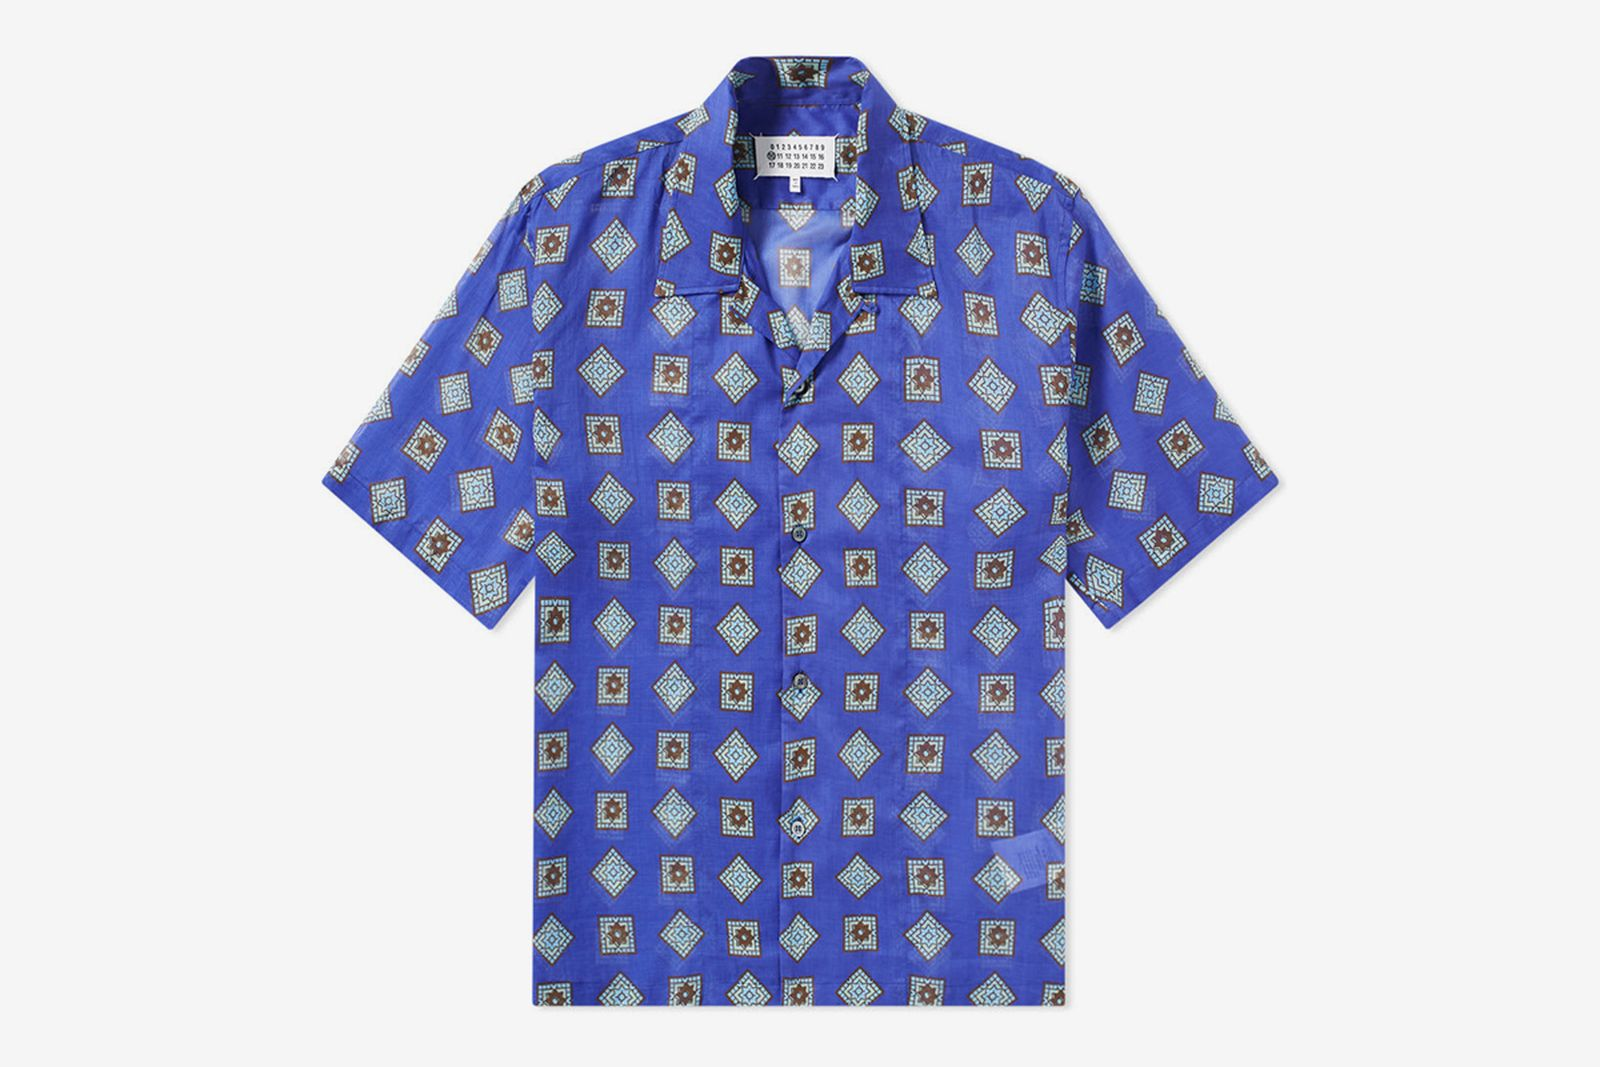 Maison Margiela Muslin Vacation Shirt Stüssy end sale